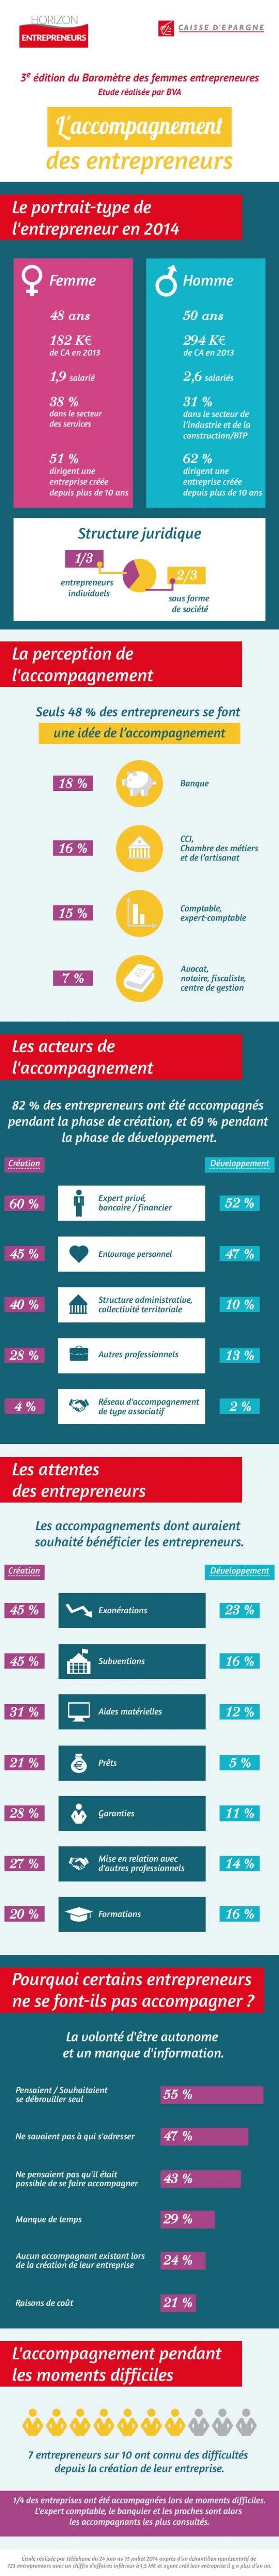 Infographie barometre-femmes-entrepreneures-2014